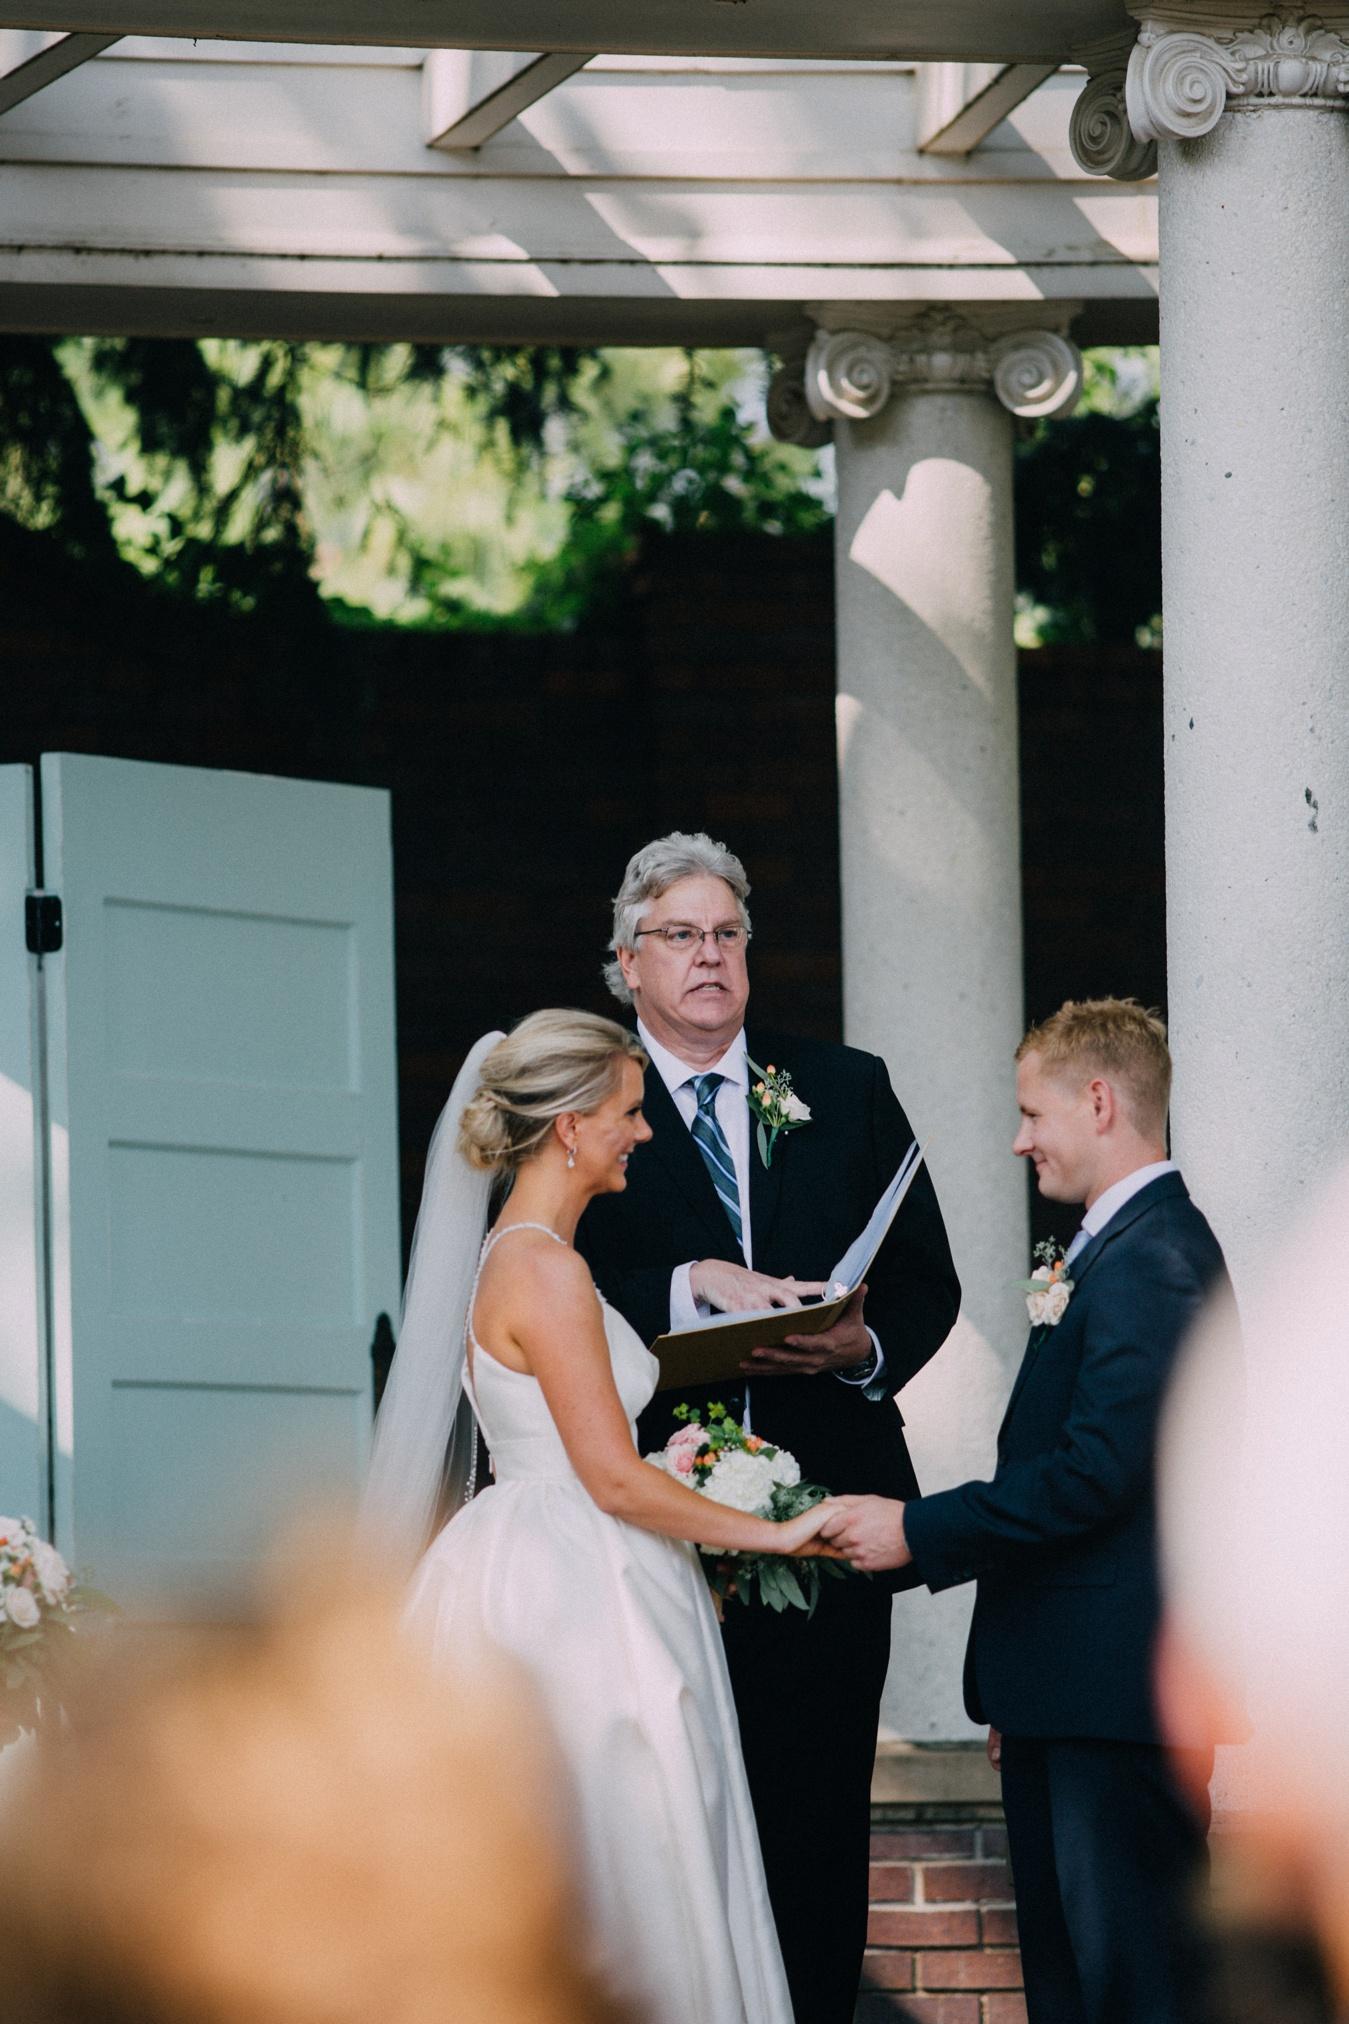 brenna+michael_wedding-406.jpg